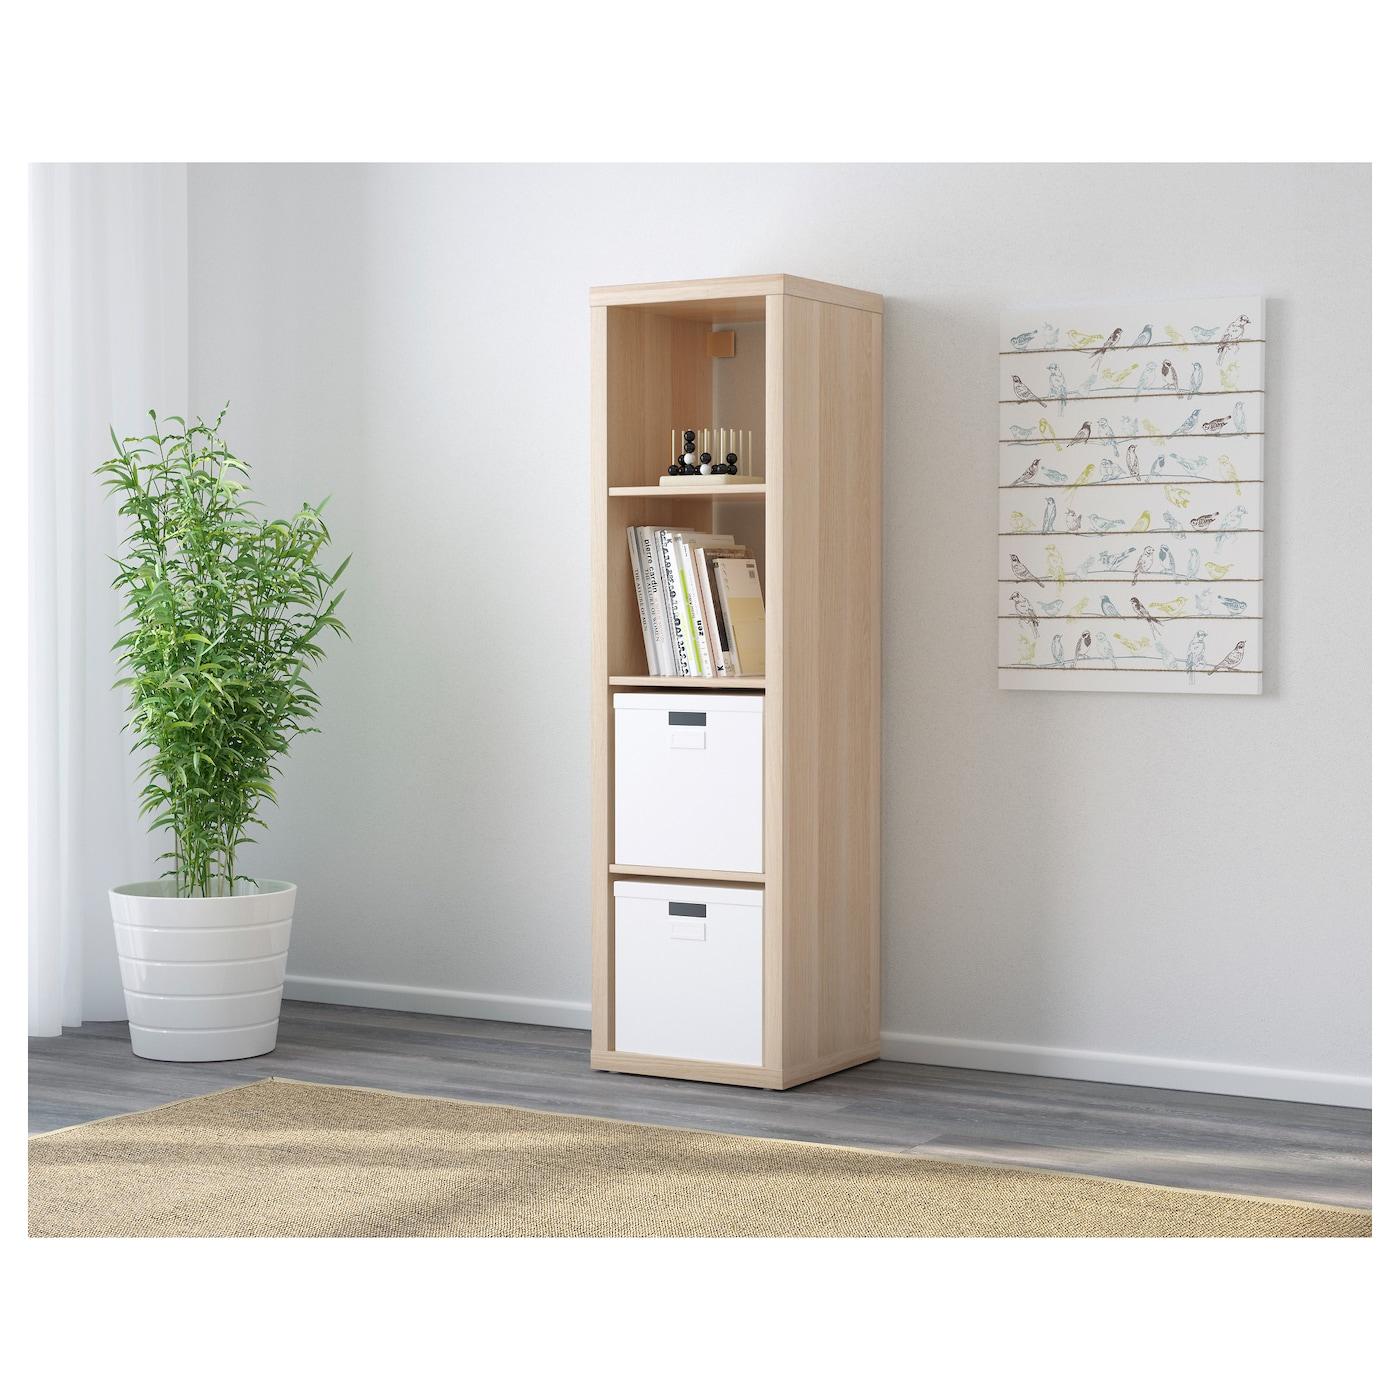 kallax tag re effet ch ne blanchi 42 x 147 cm ikea. Black Bedroom Furniture Sets. Home Design Ideas